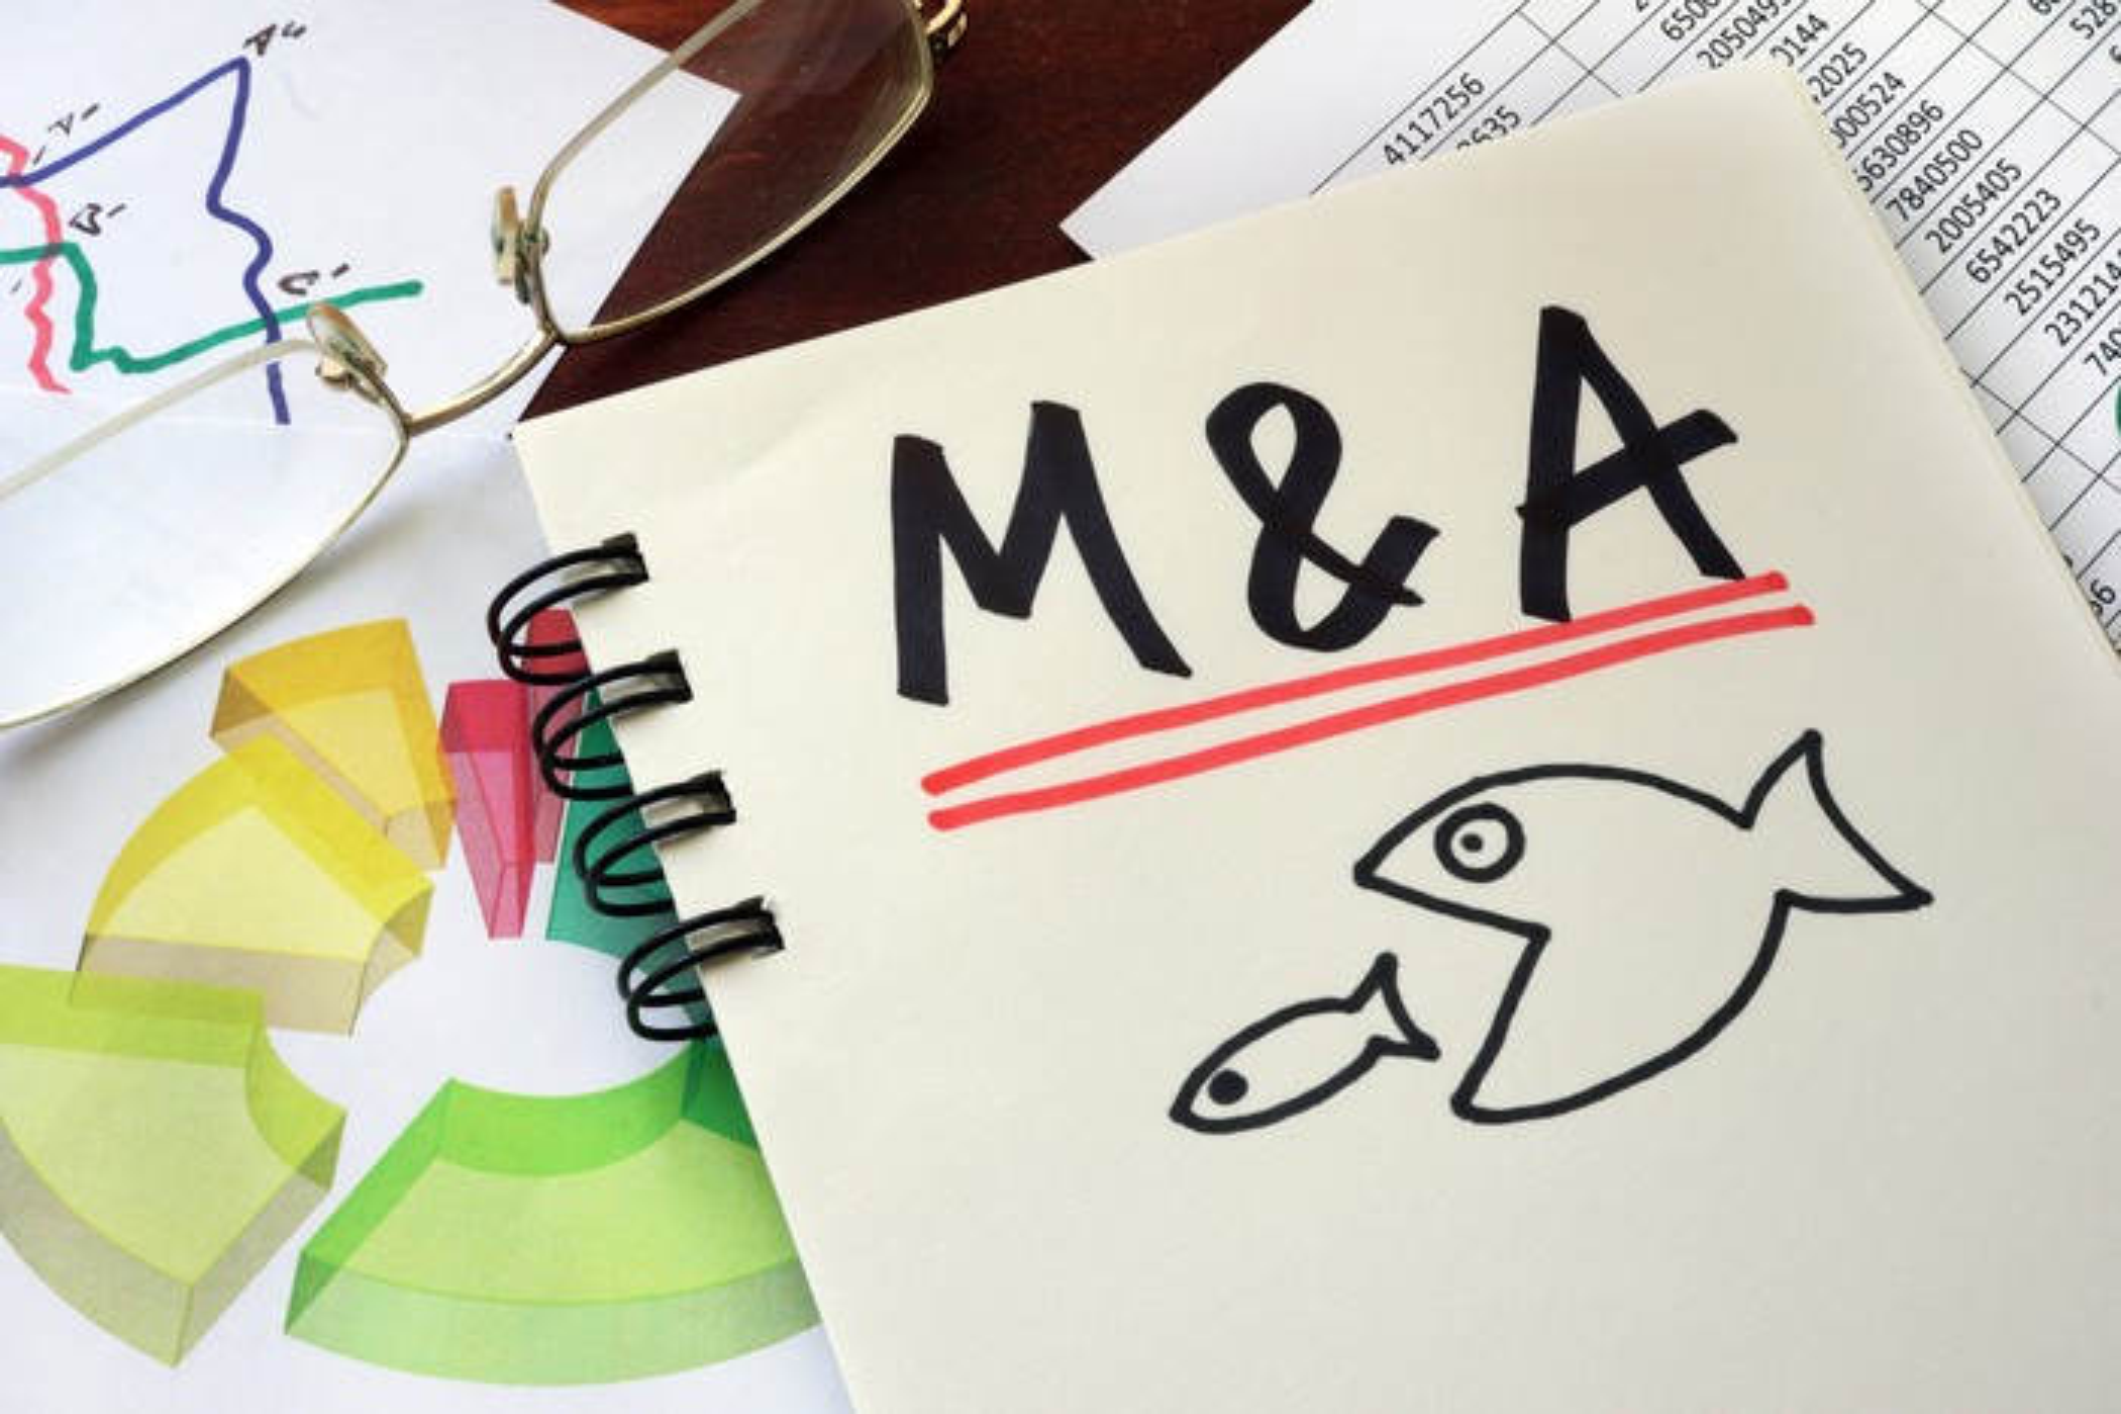 A notepad drawing of a big fish eating a small fish.